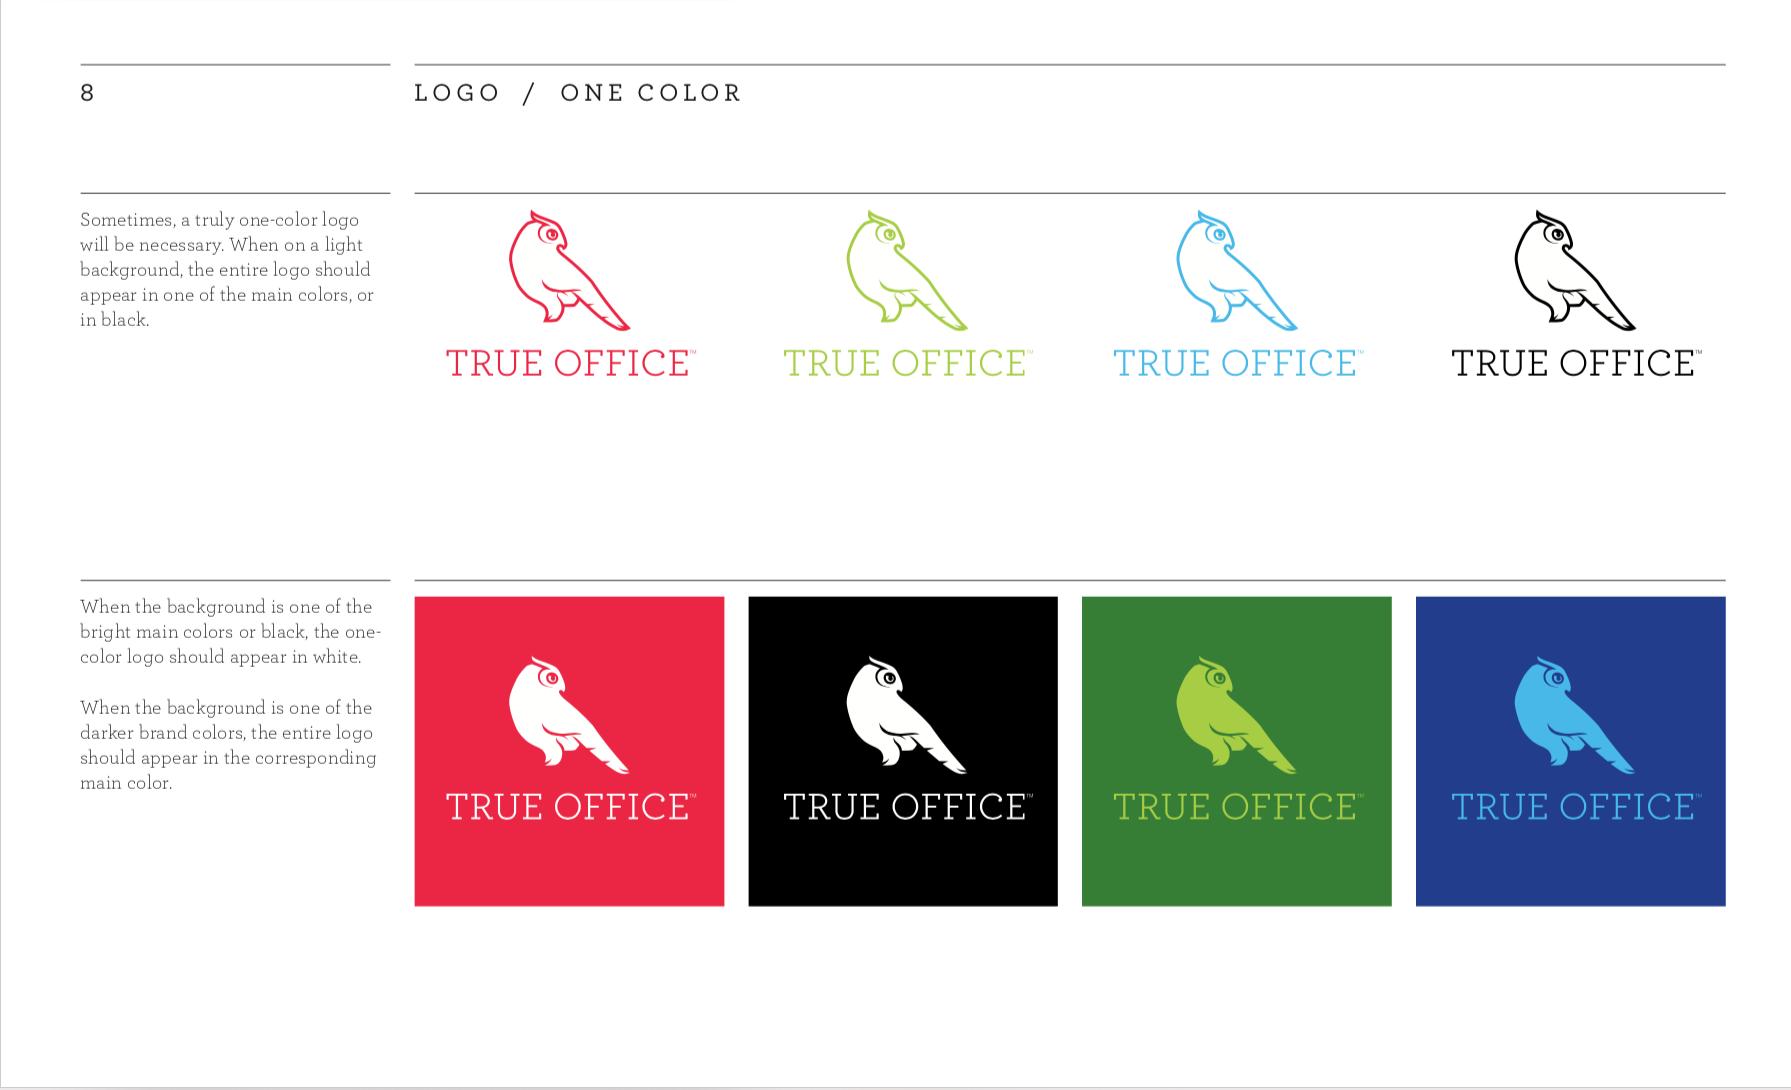 True Office single-color logo